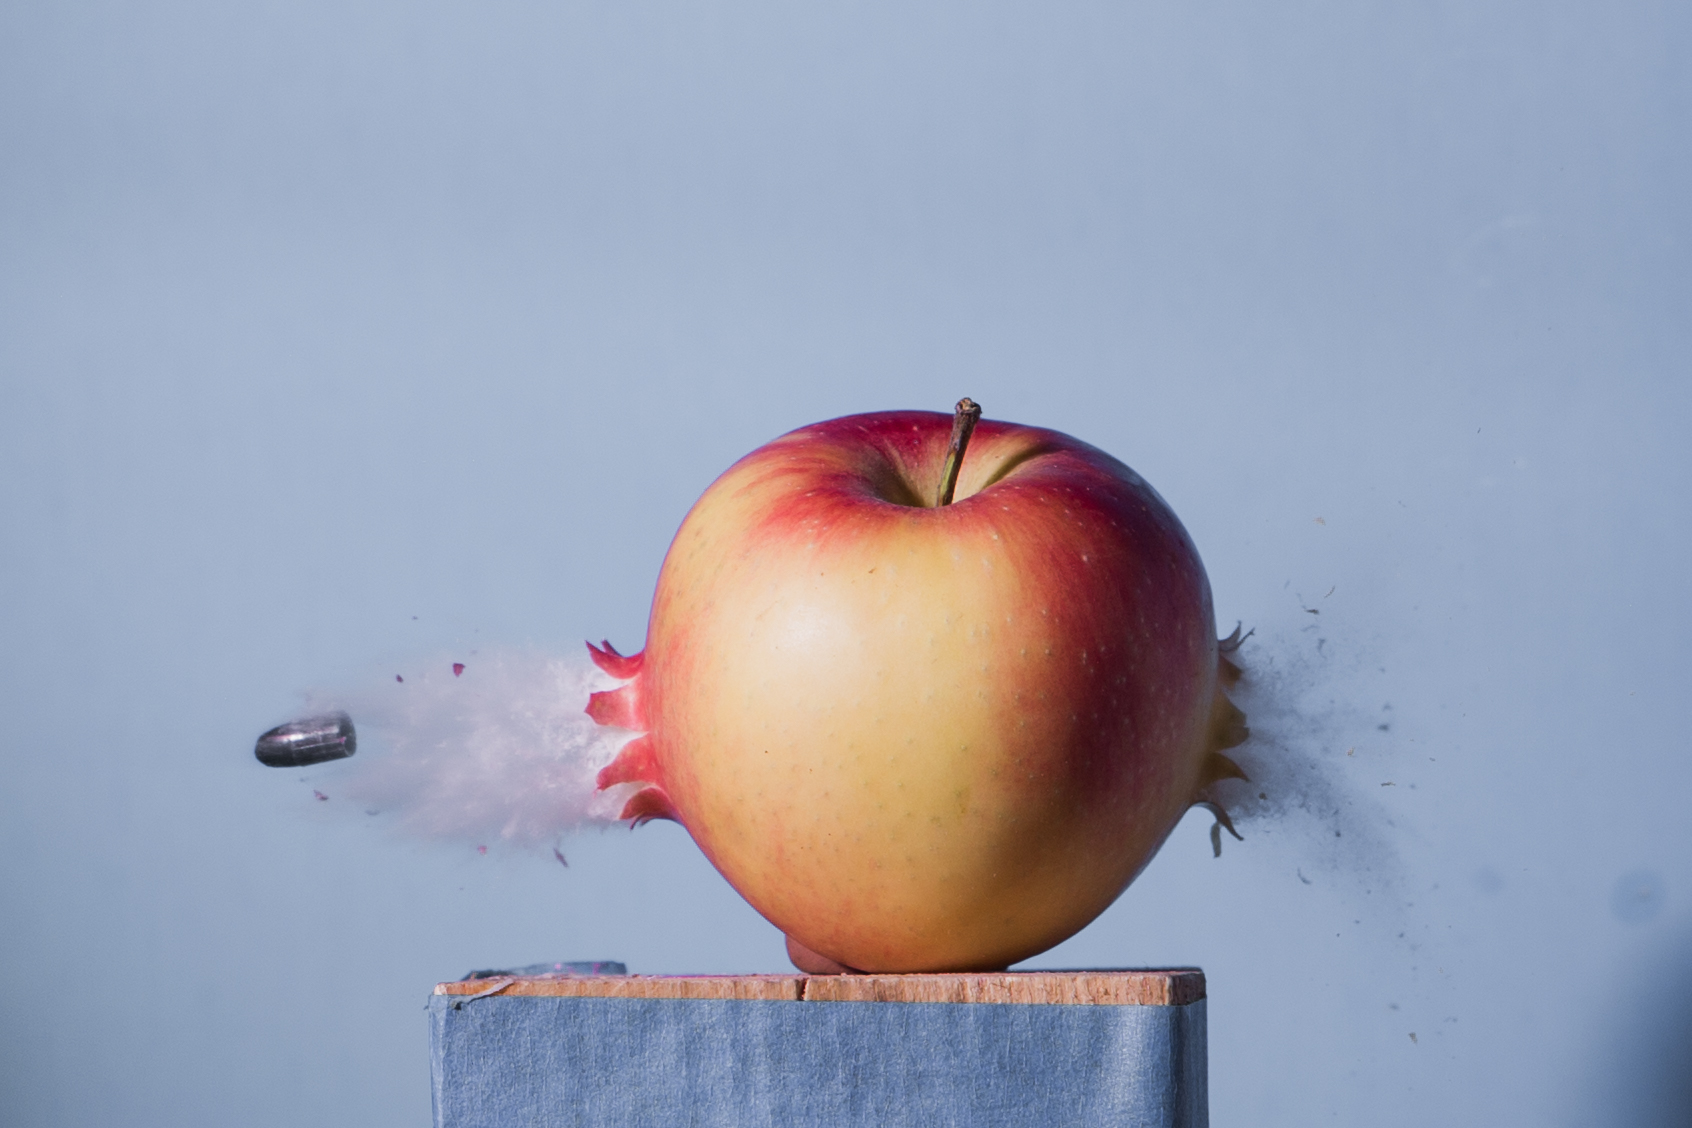 A photo of a bullet going through an apple.